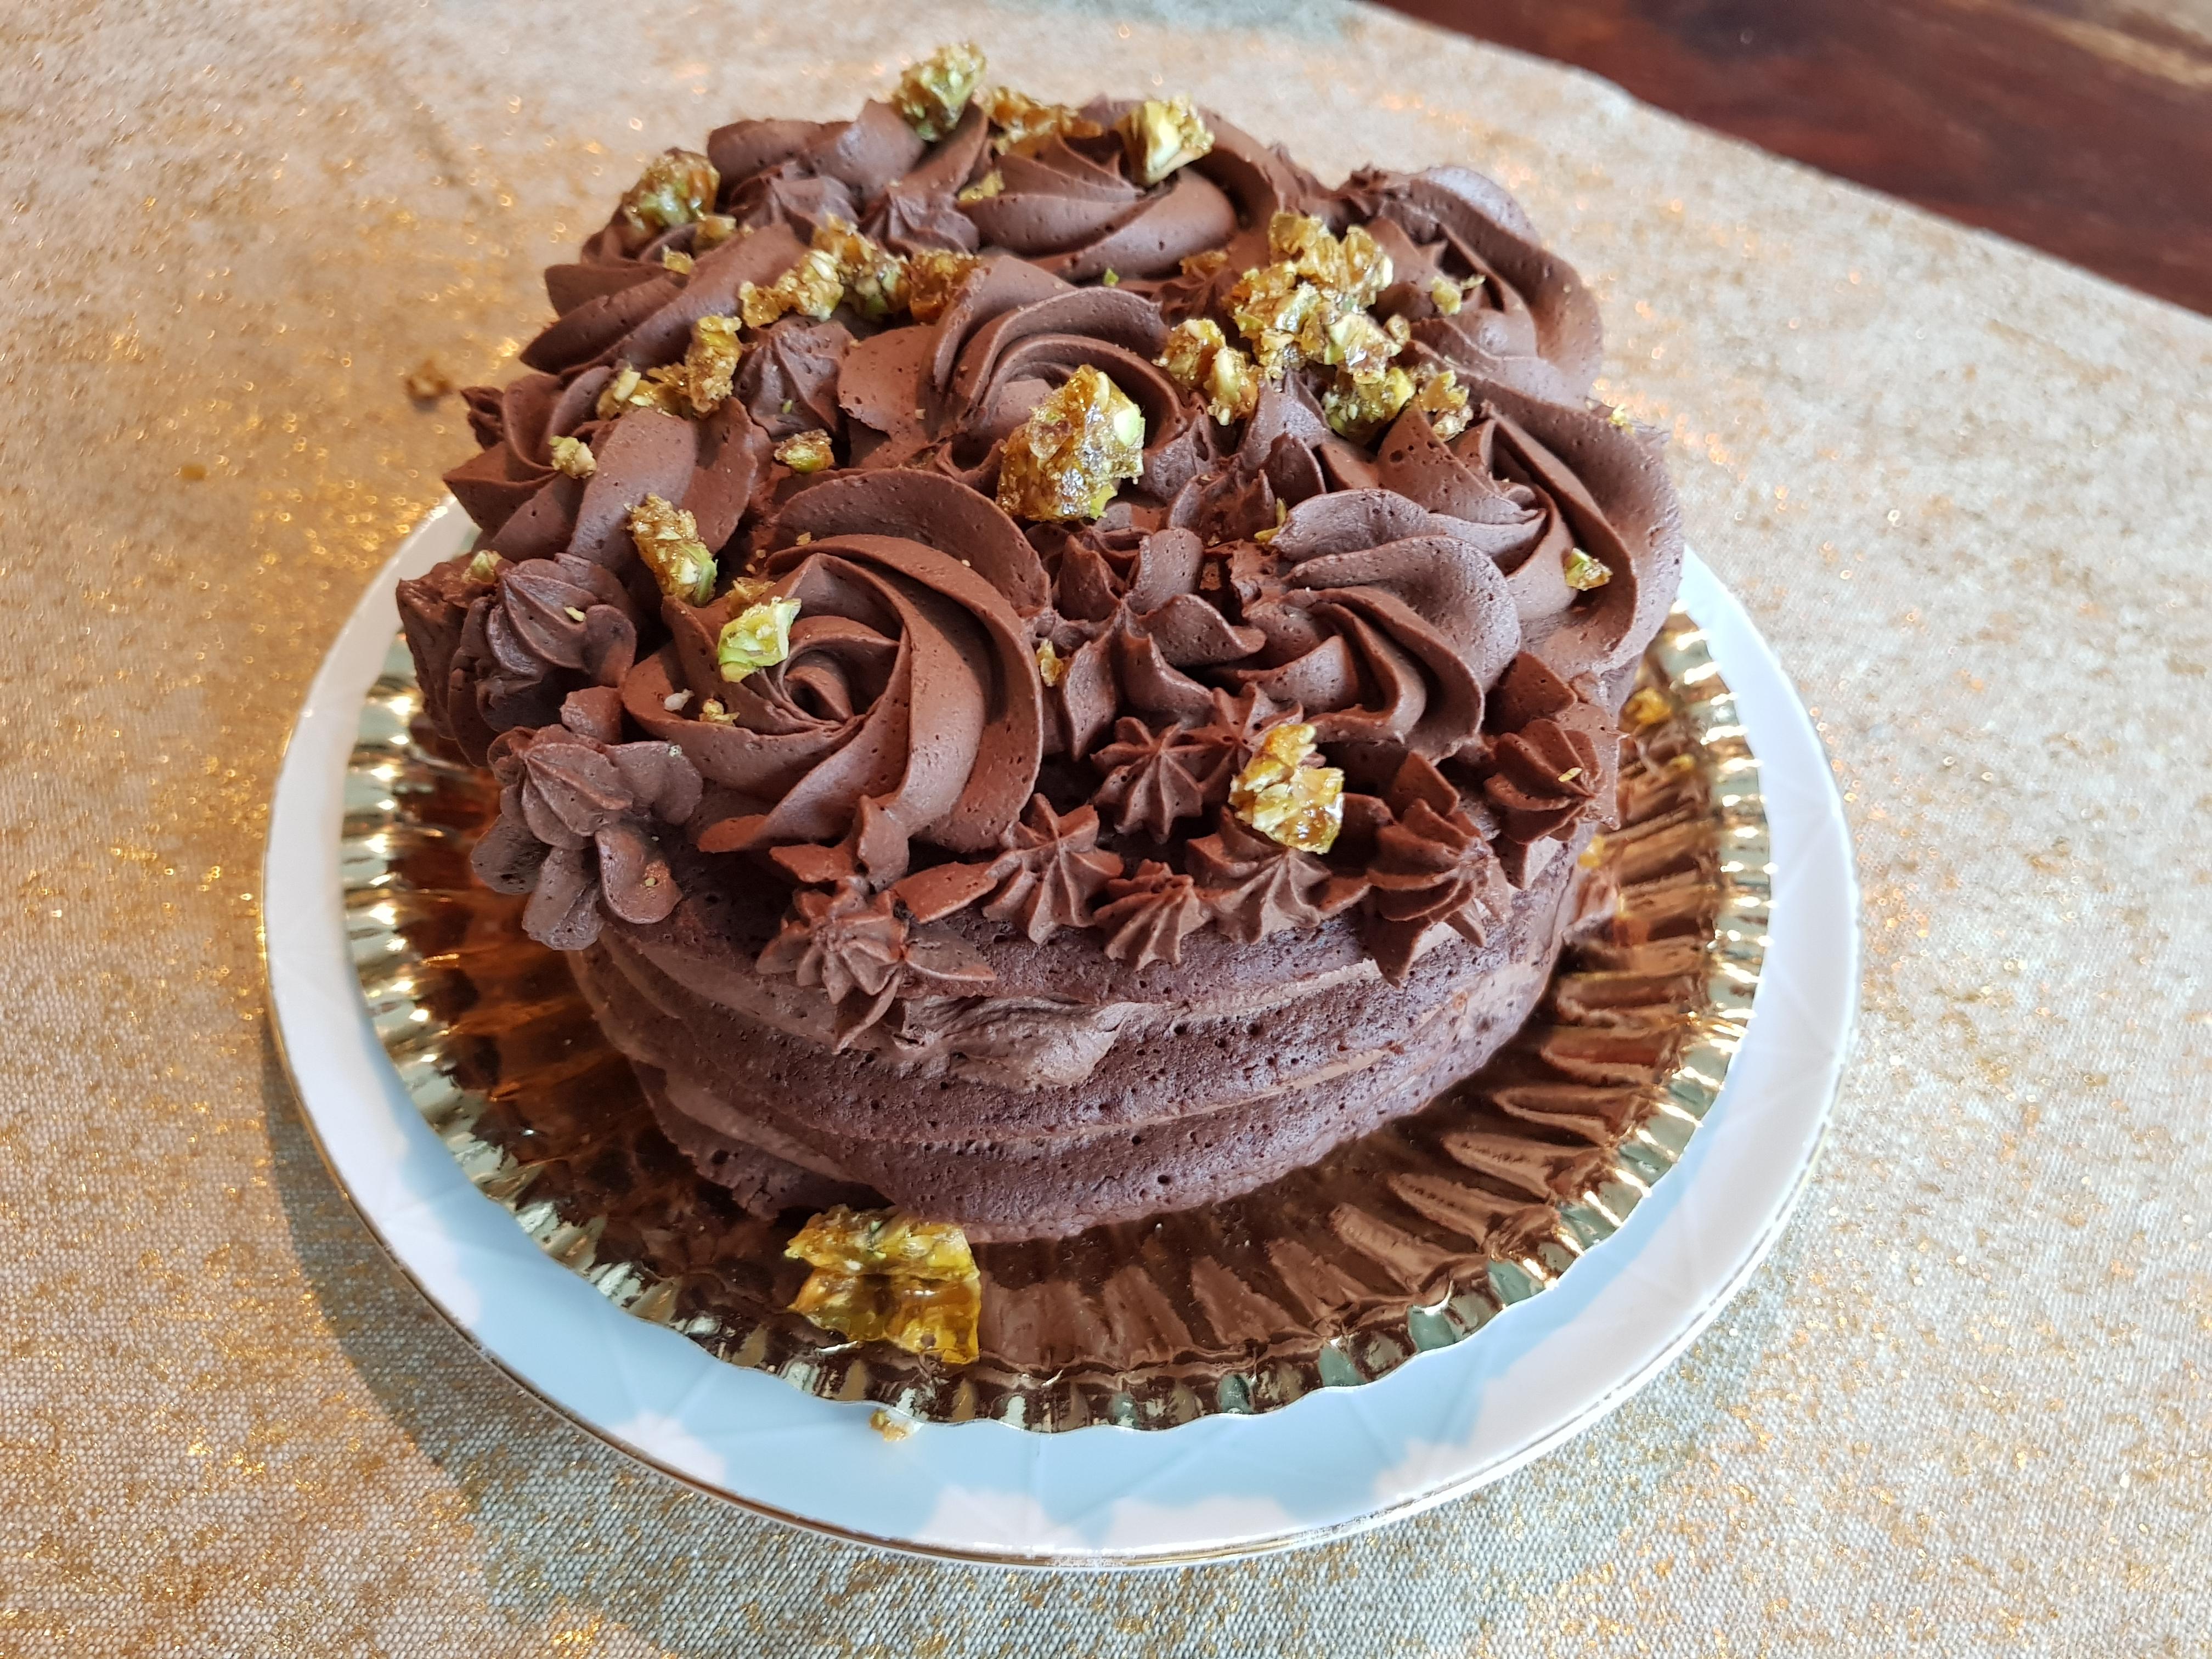 Lavkarbo 4-lags Sjokoladekake i mikrobølgeovn!